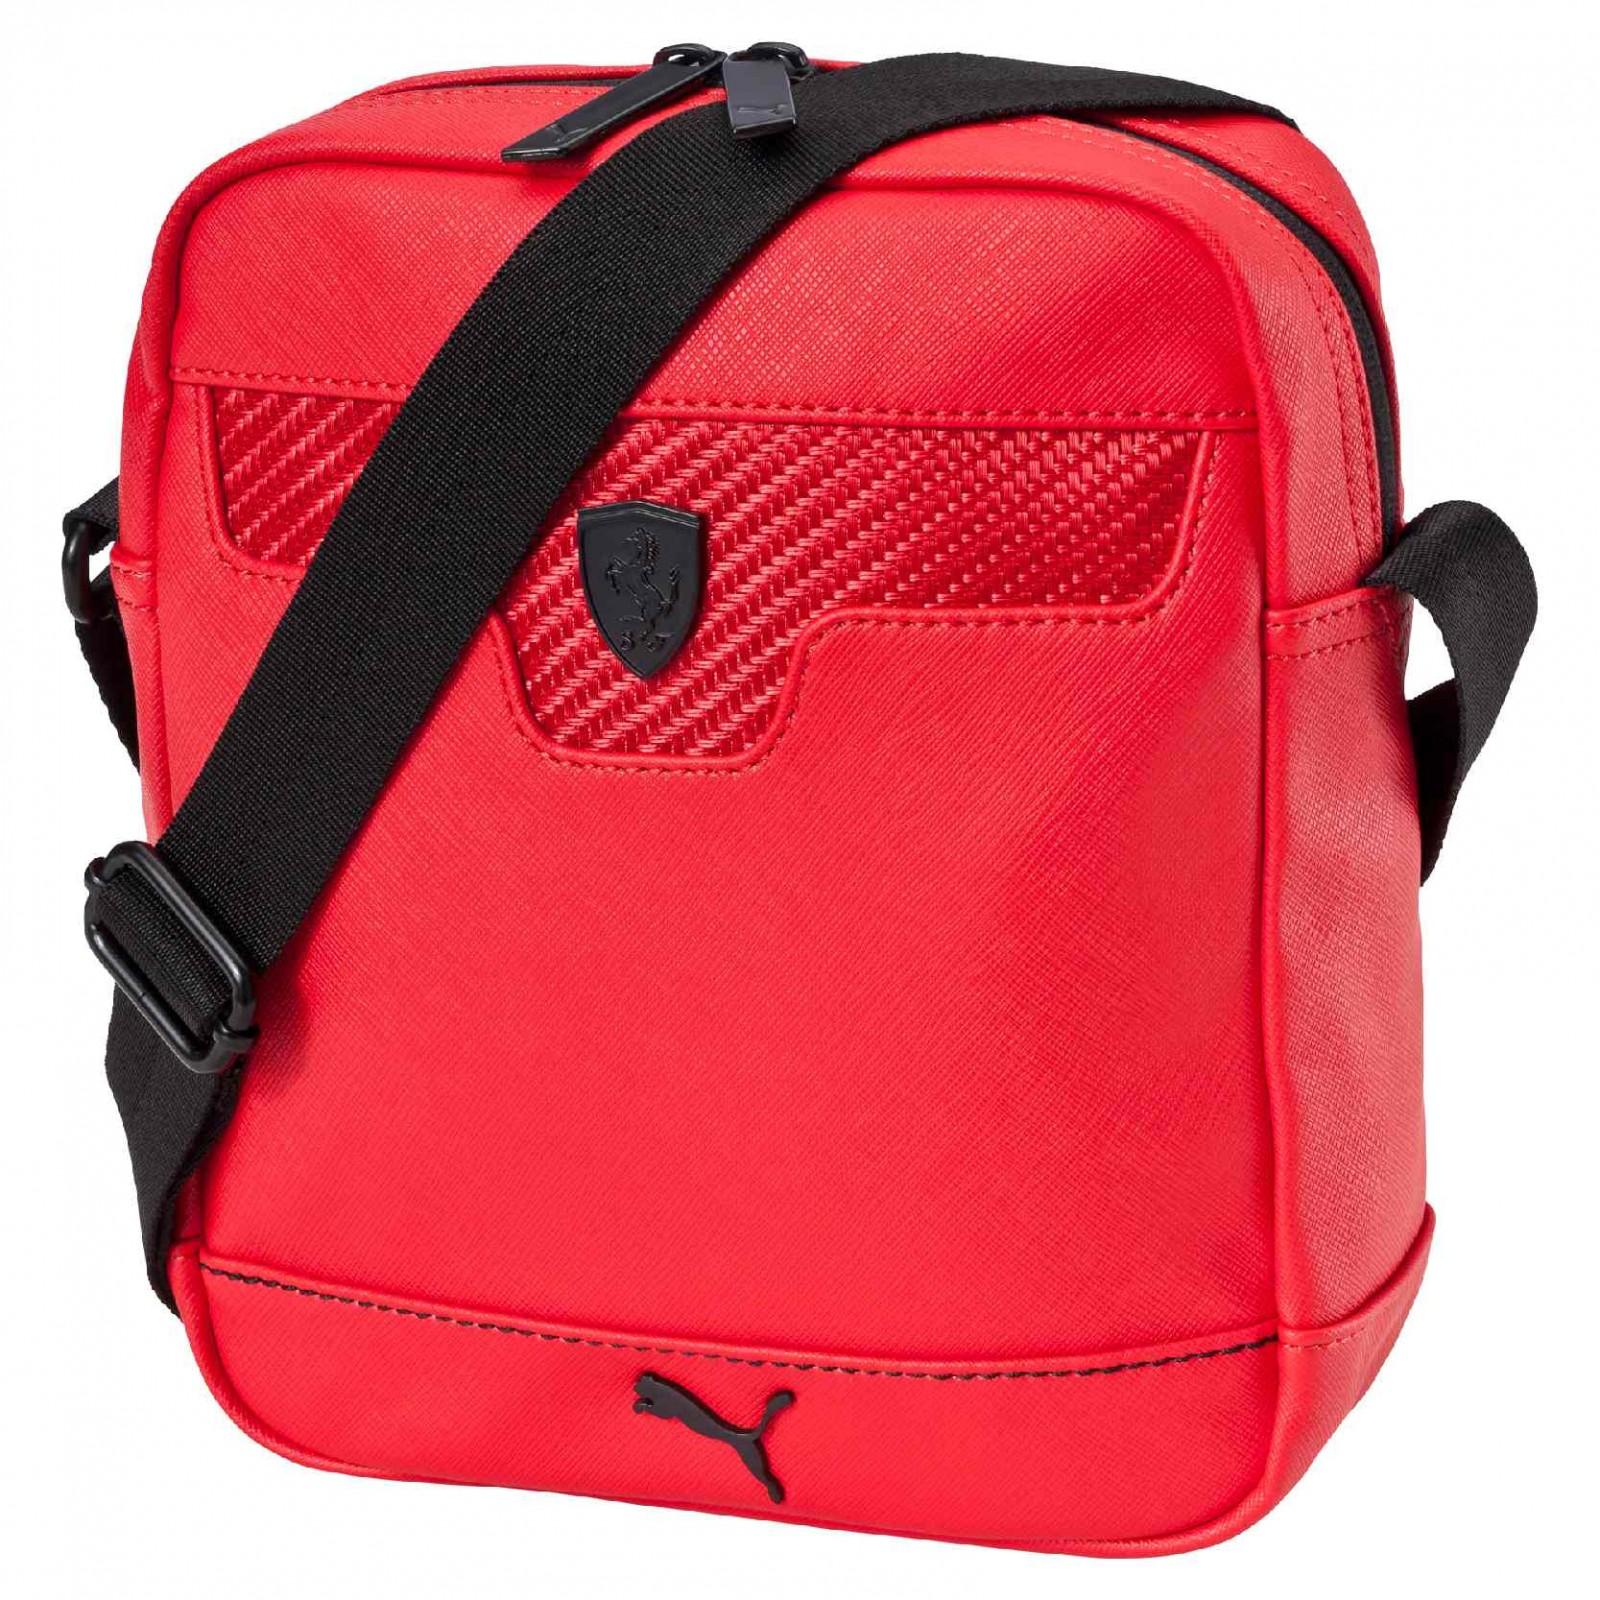 0717caa7f3 Pánská taška Puma Ferrari LS Portable Rosso Cors